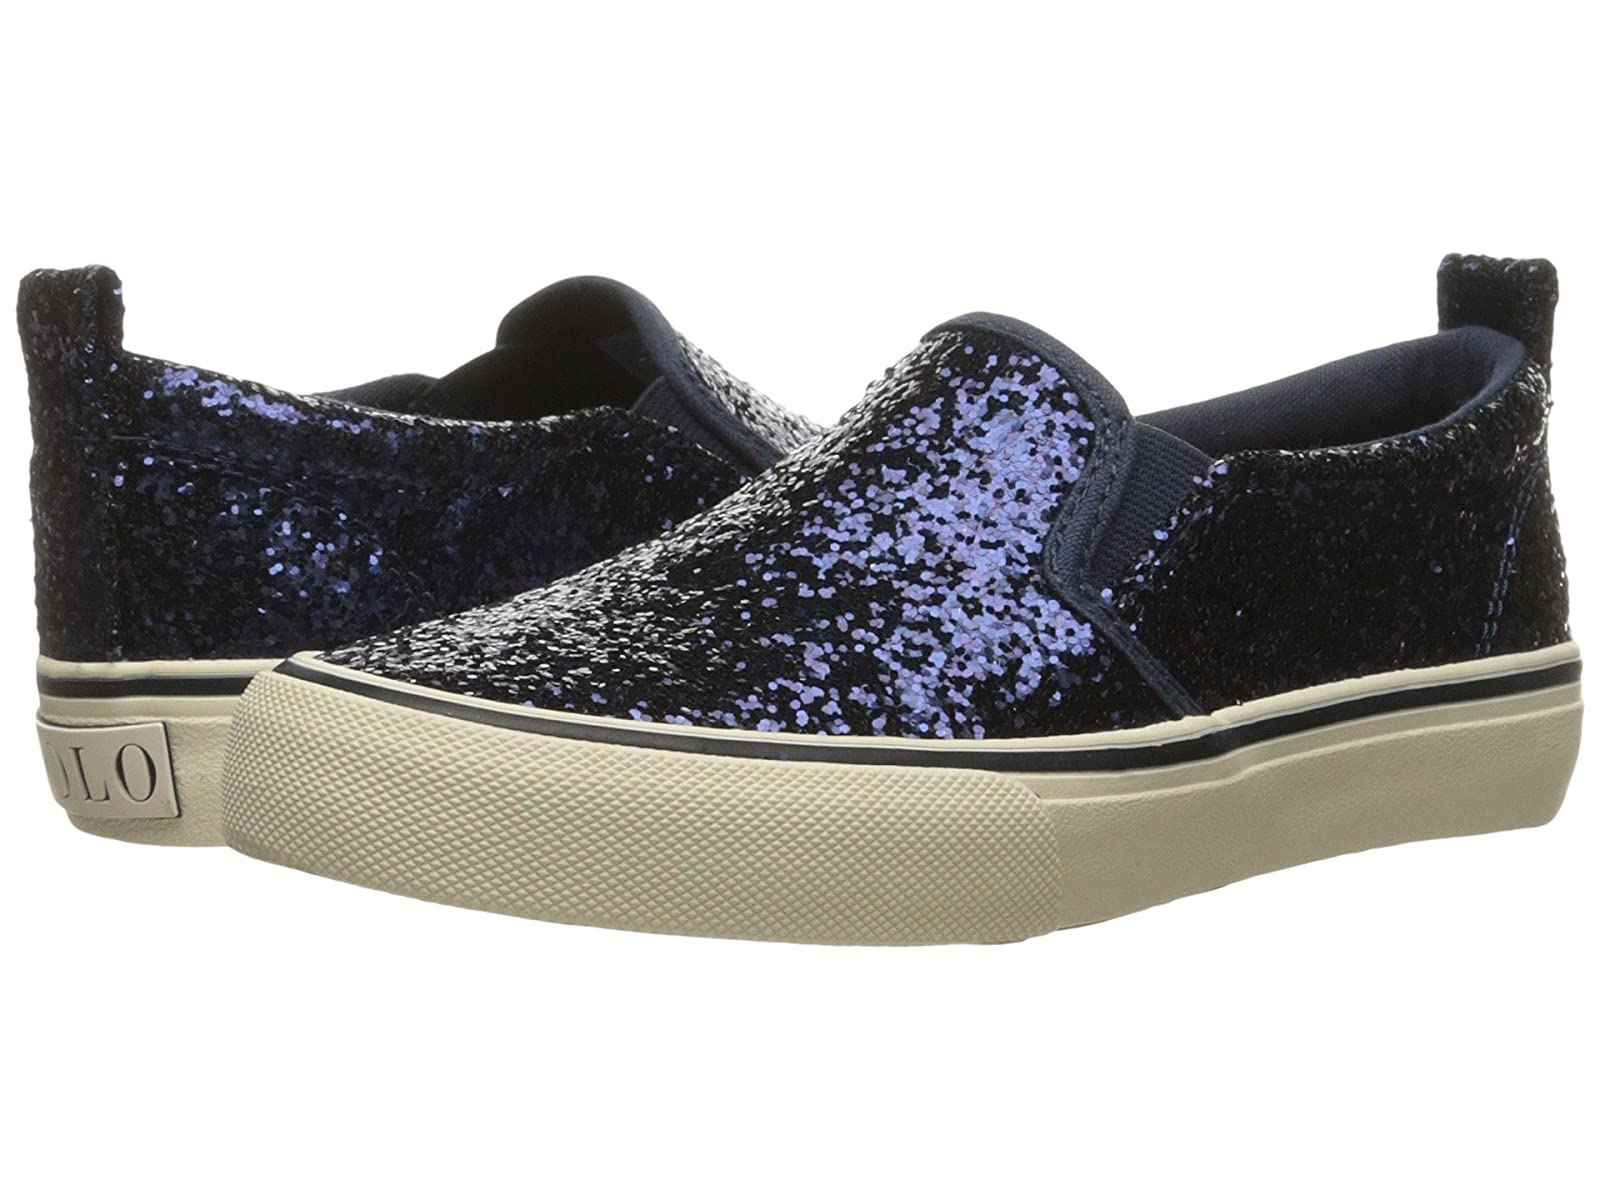 Polo Ralph Lauren Kids Carlee Twin Gore (Little Kid/Big Kid)Cheap and distinctive eye-catching shoes